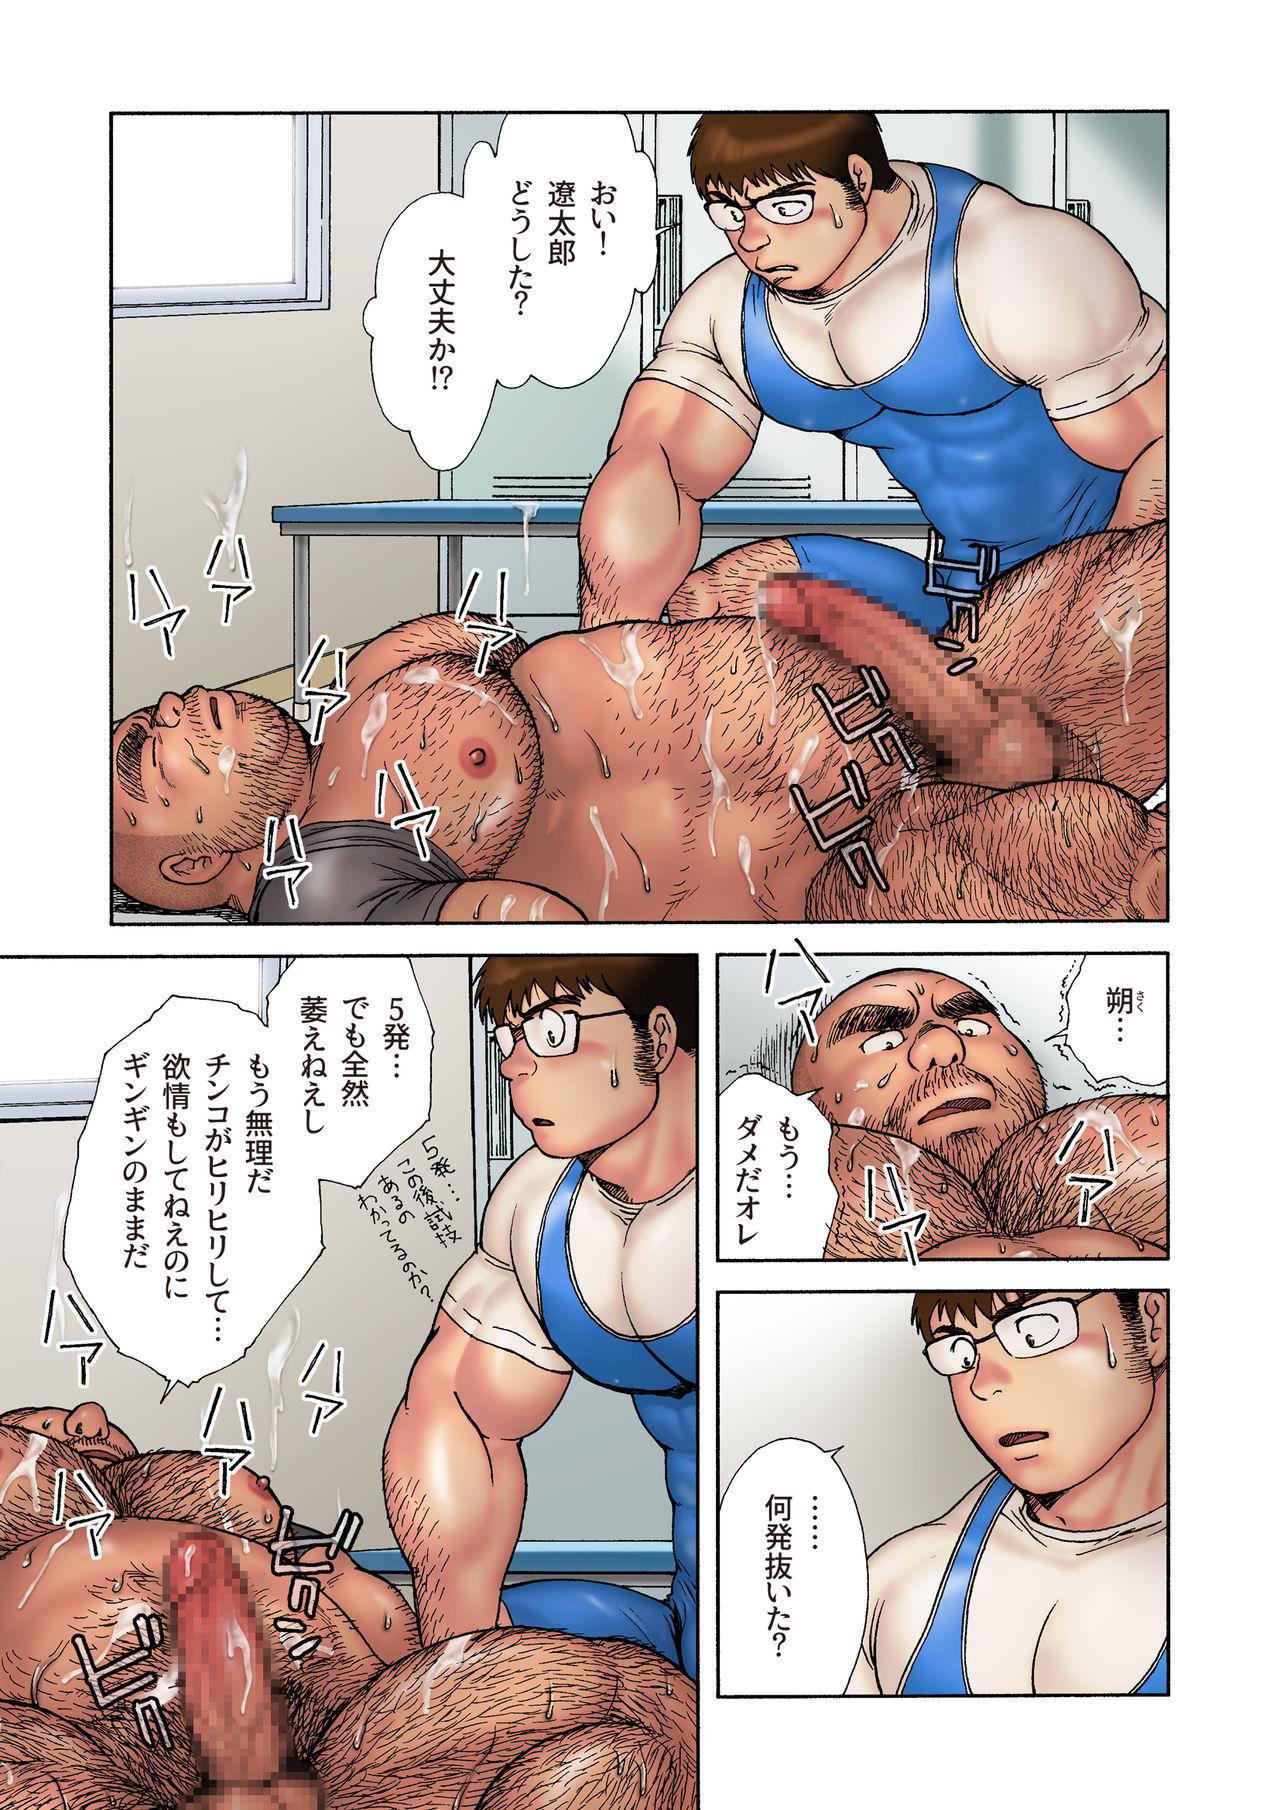 Danshi Koukousei Weightlifter Shiai-chuu, Osae kirenai Wakai Takeri 37